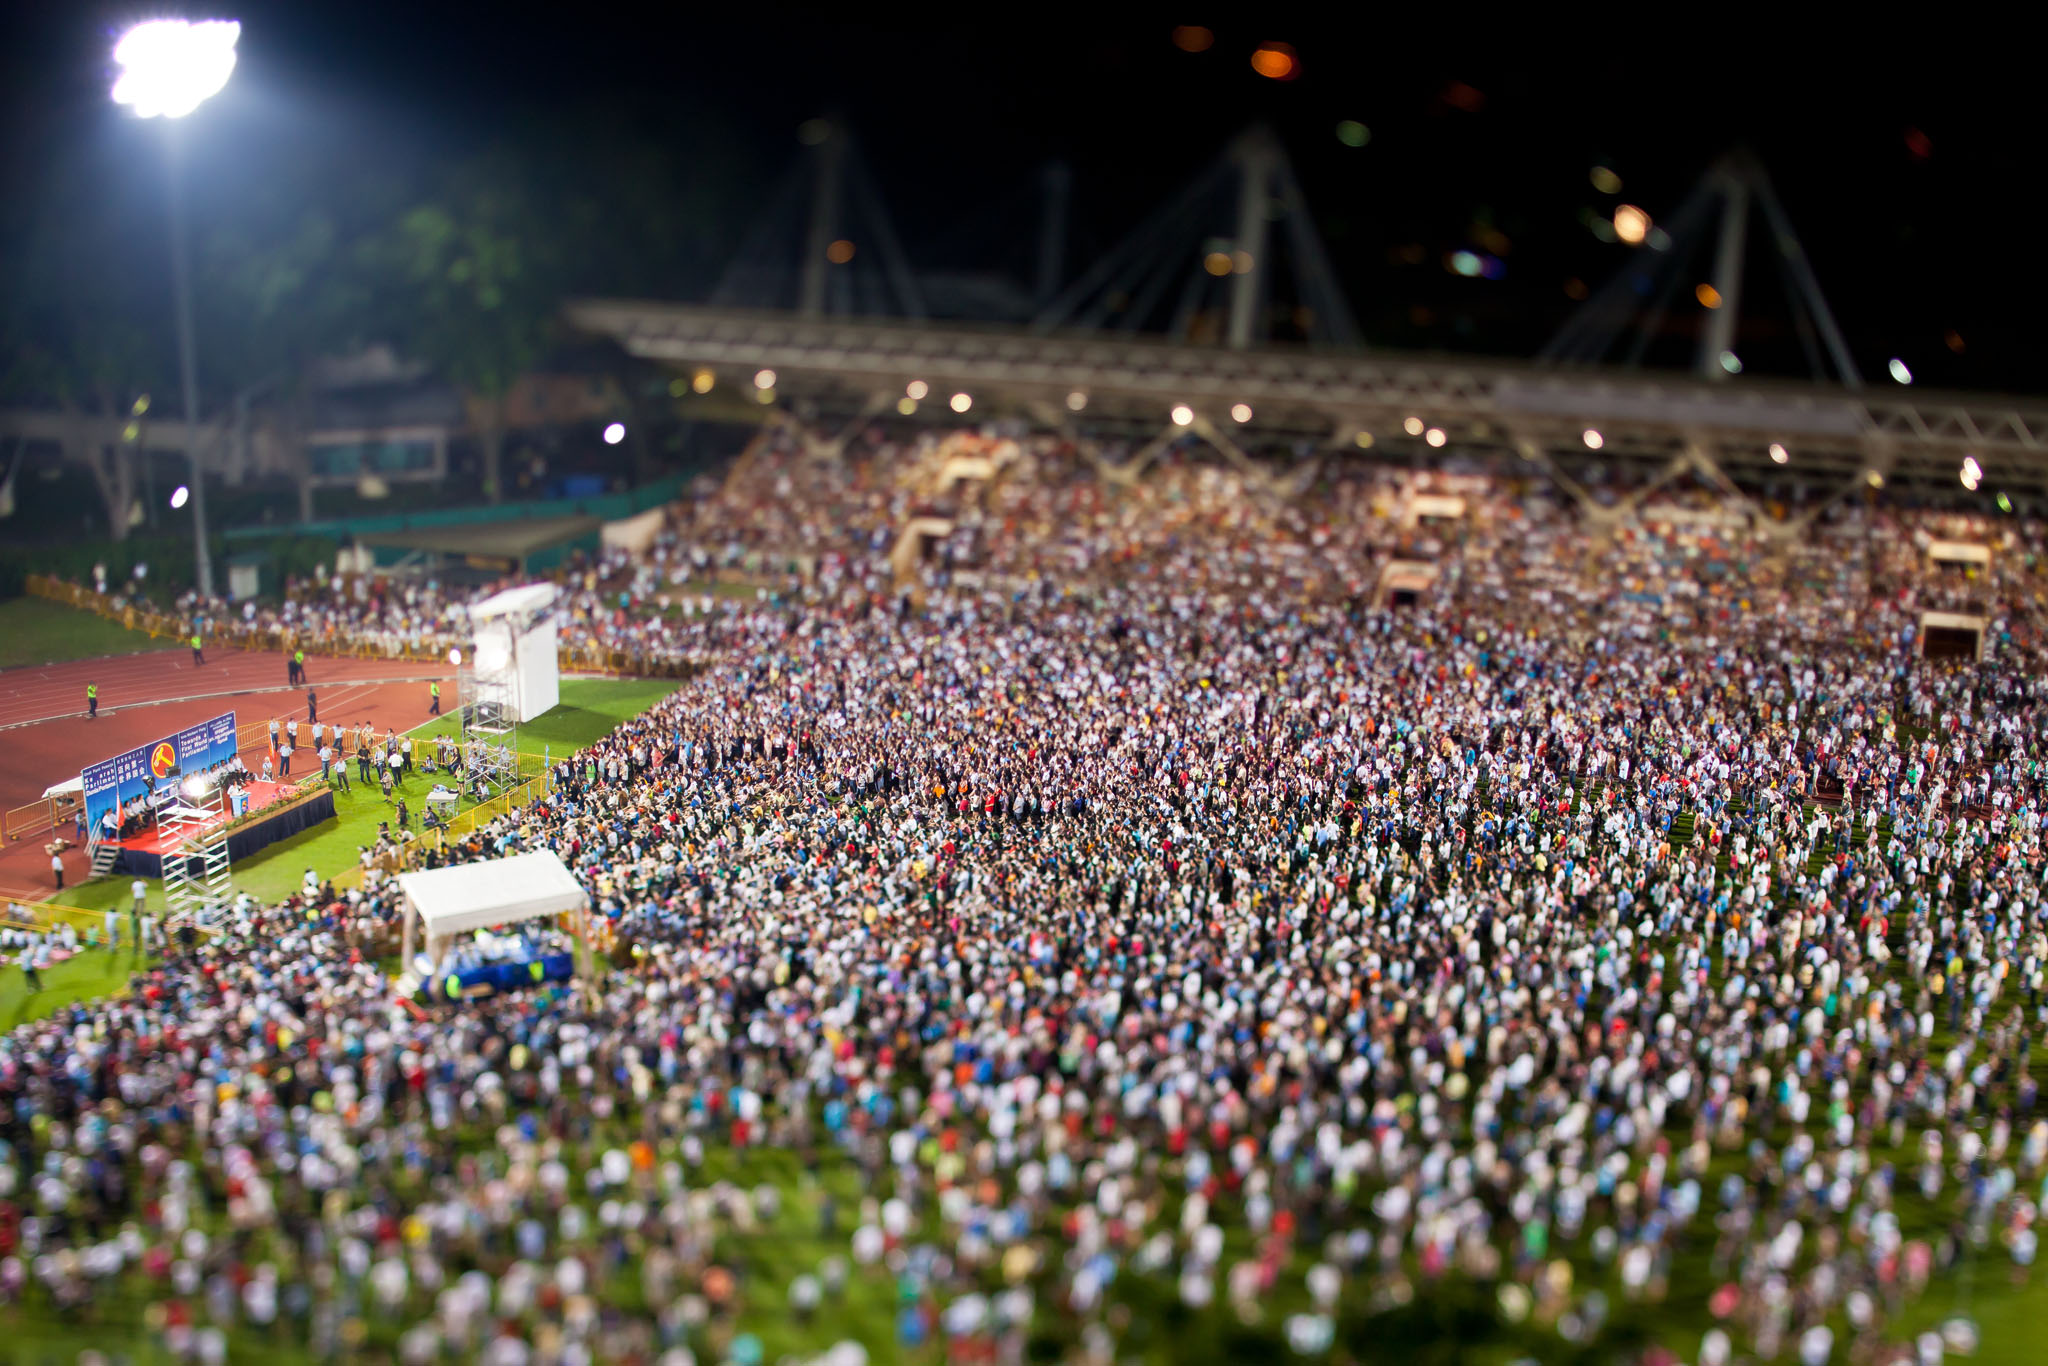 singapore-commercial-photographer-editorial-documentary-tiltshift-singaplural-zakaria-zainal-01.jpg